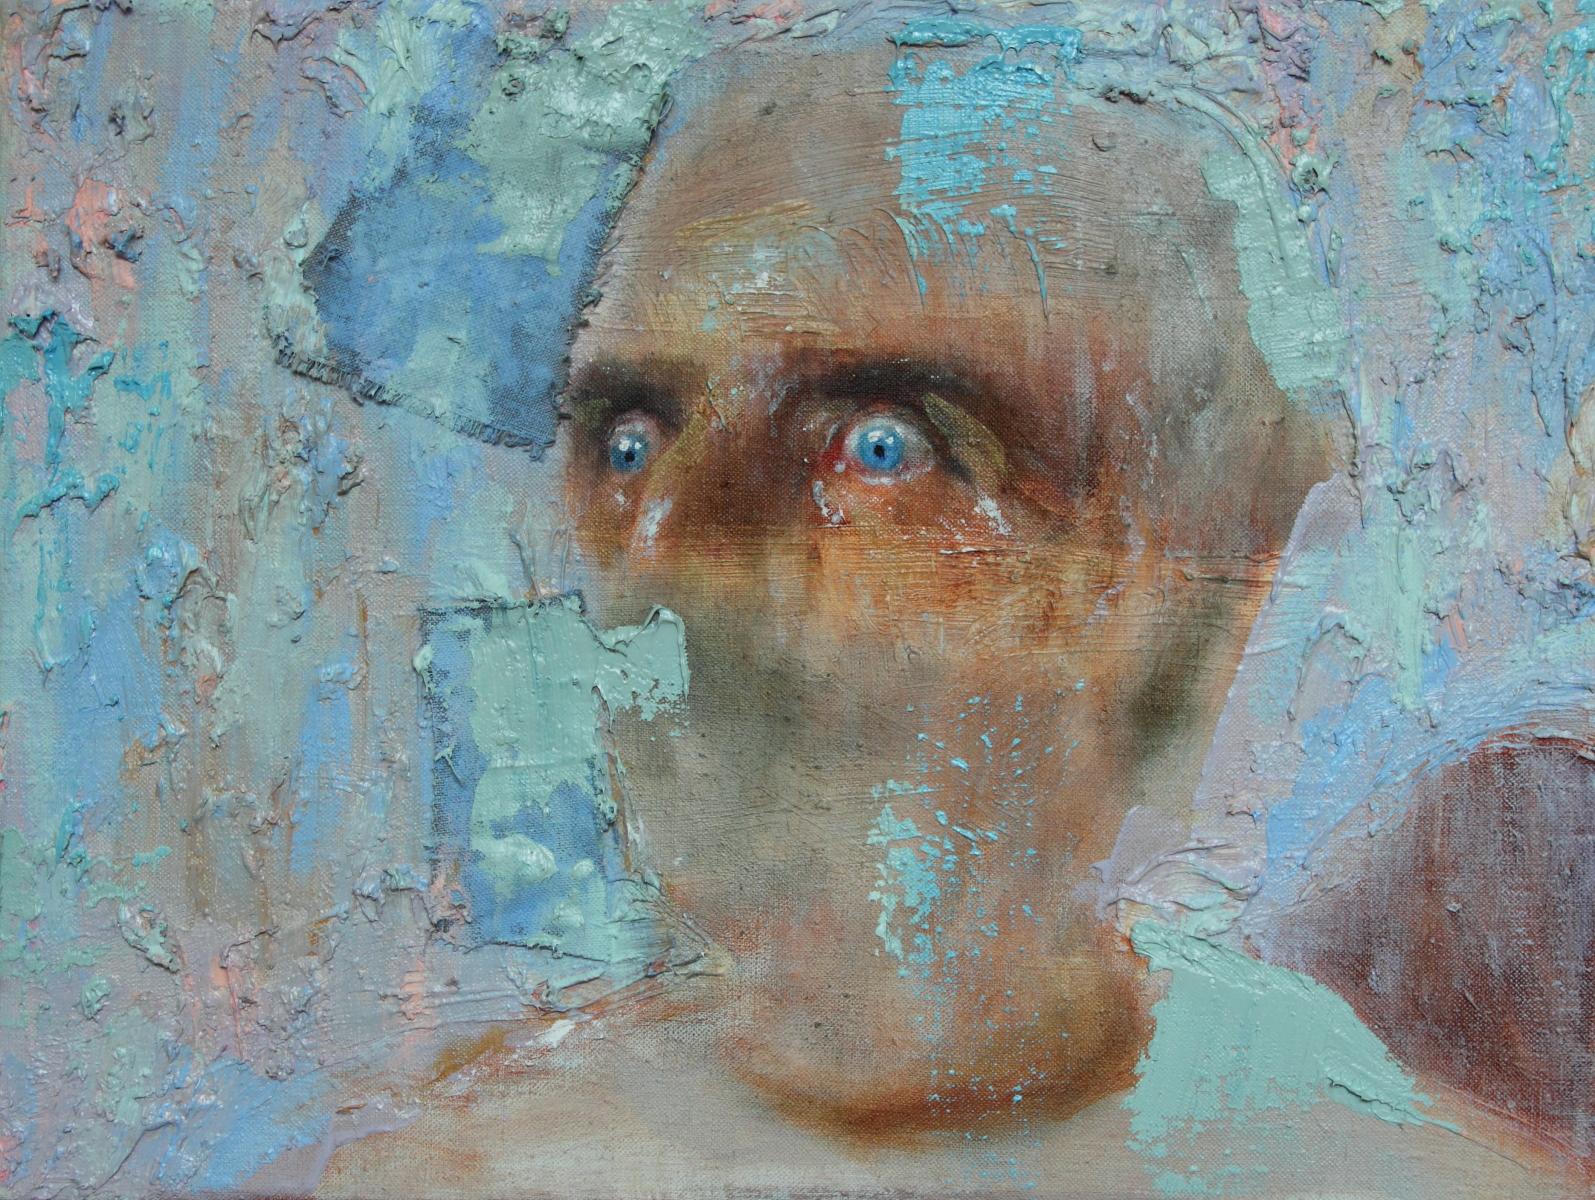 Tom Robertson, ICU, Oil on Linen, 30 x 40 cm,  http://www.tomrob-art.co.uk